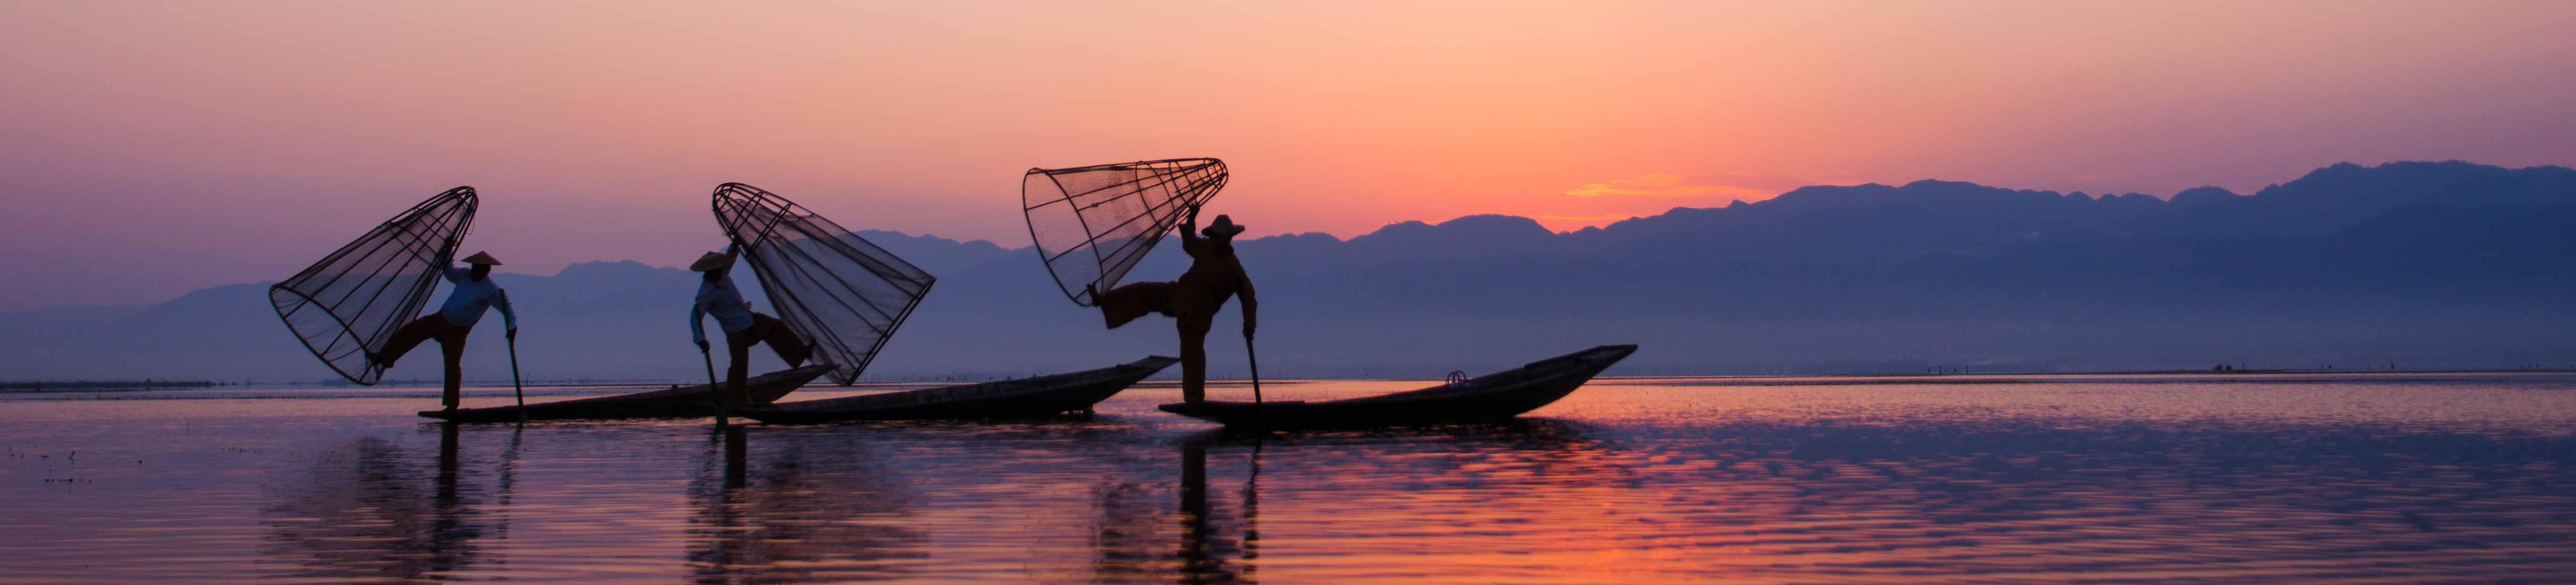 Que voir en Birmanie ?